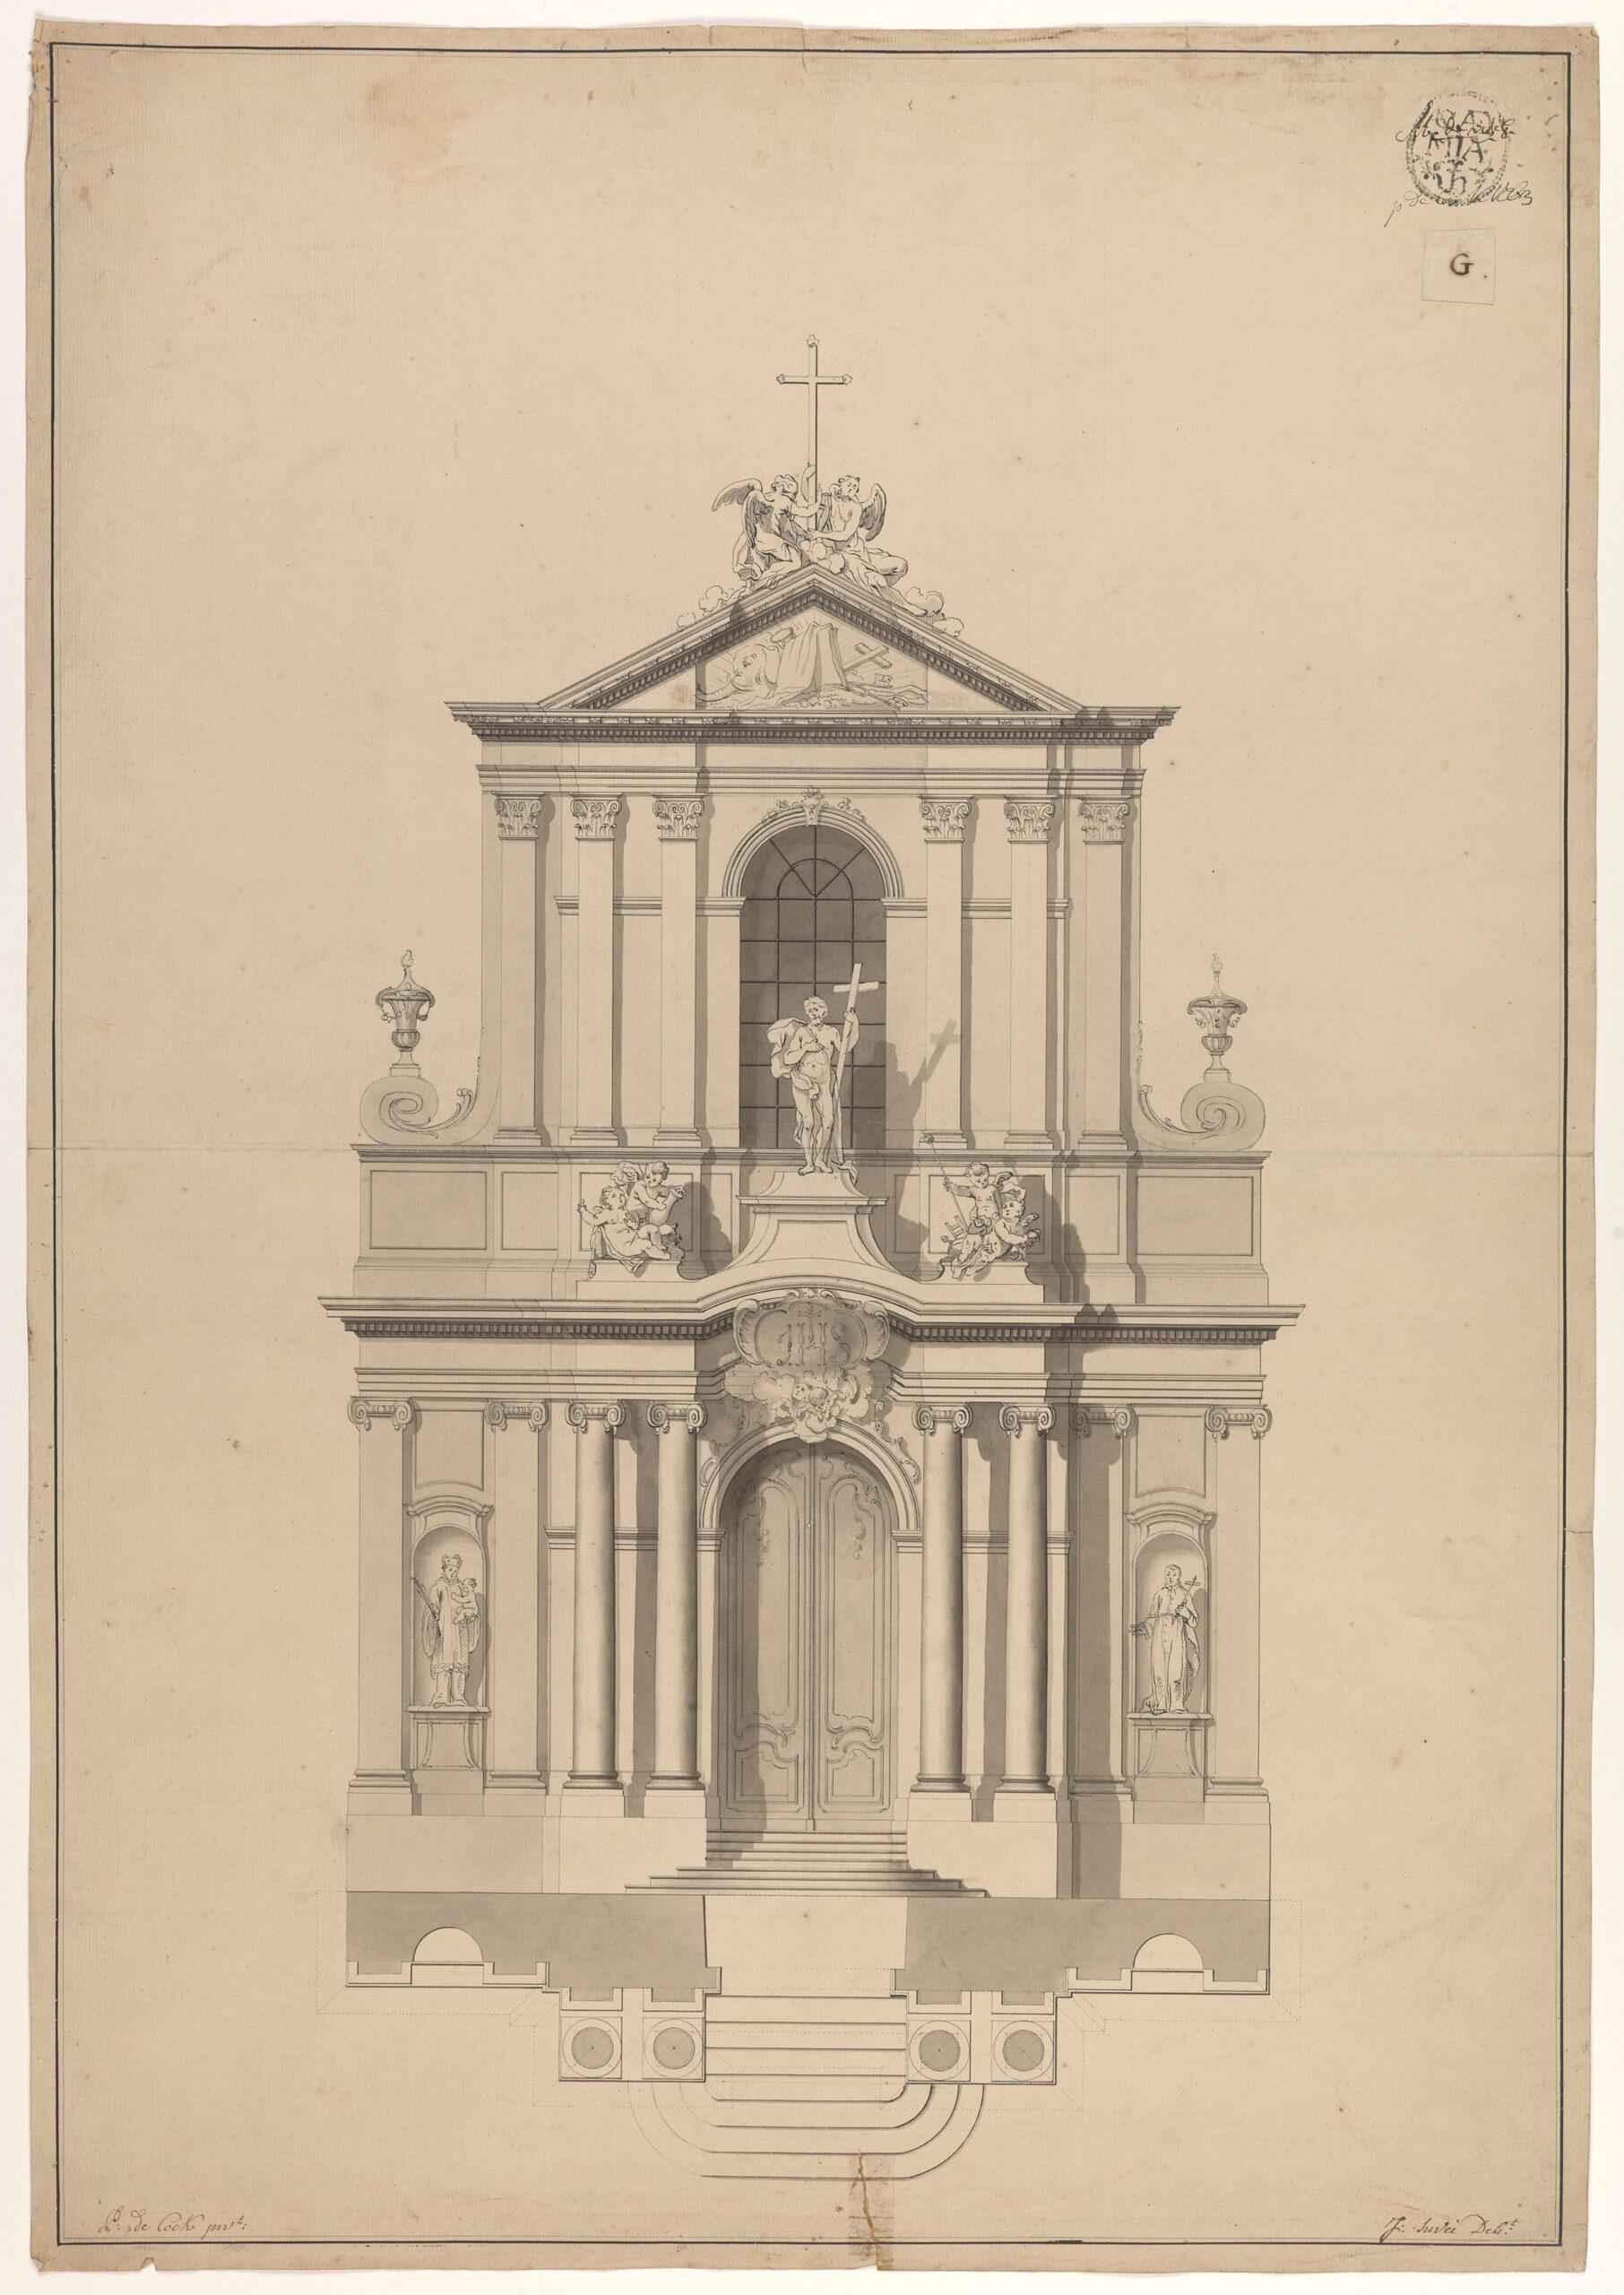 Fig. 7: Joseph Benoît Suvée (1743-1807), Design for the Façade of a Jesuit Church, Groeningemuseum, Printroom, 0014.GRO0013.II